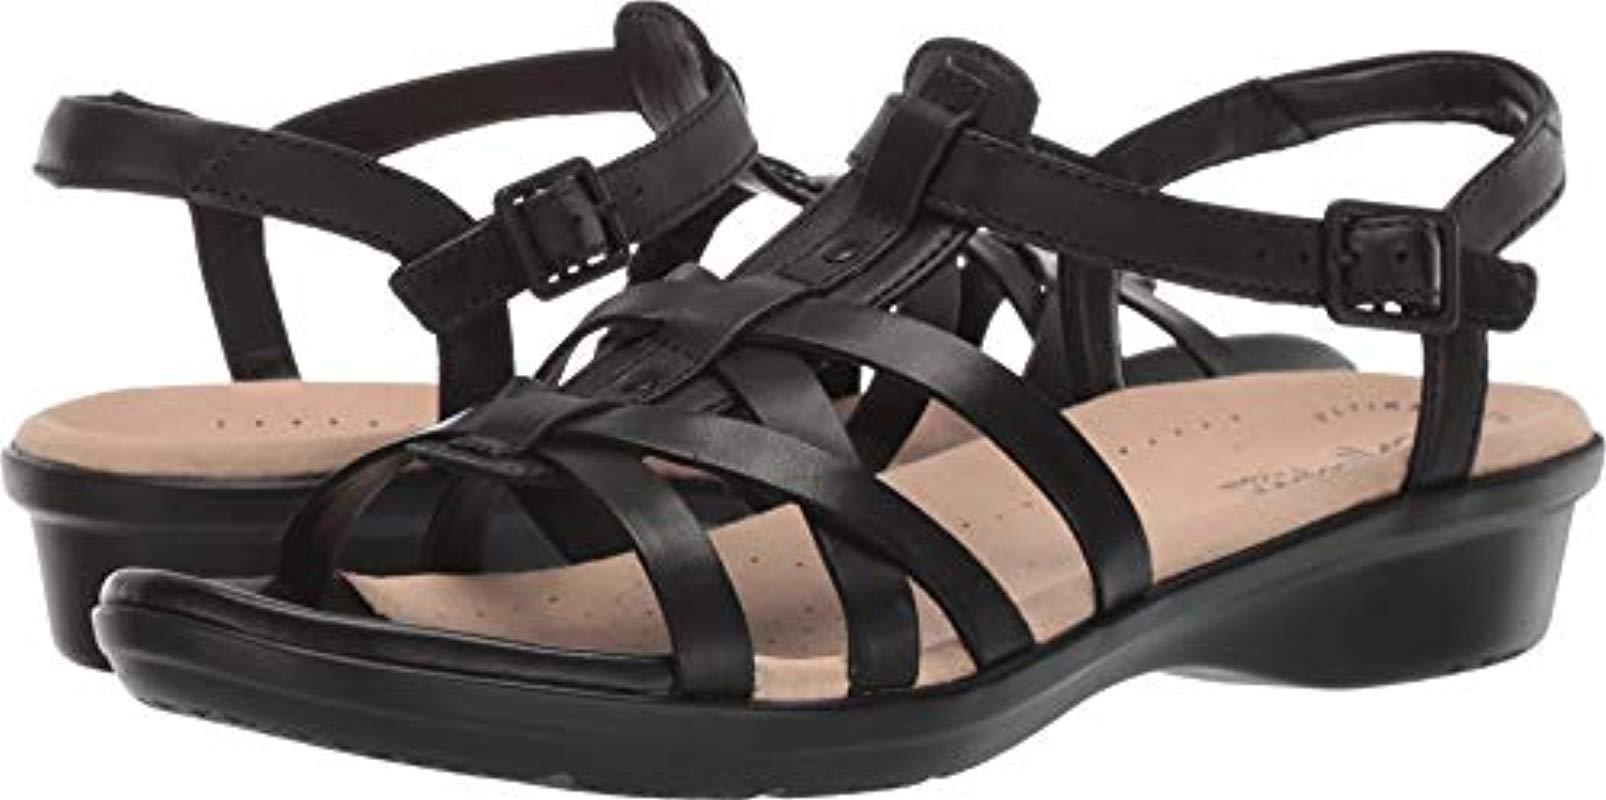 72b264d0176b Lyst - Clarks Loomis Katey Sandal in Black